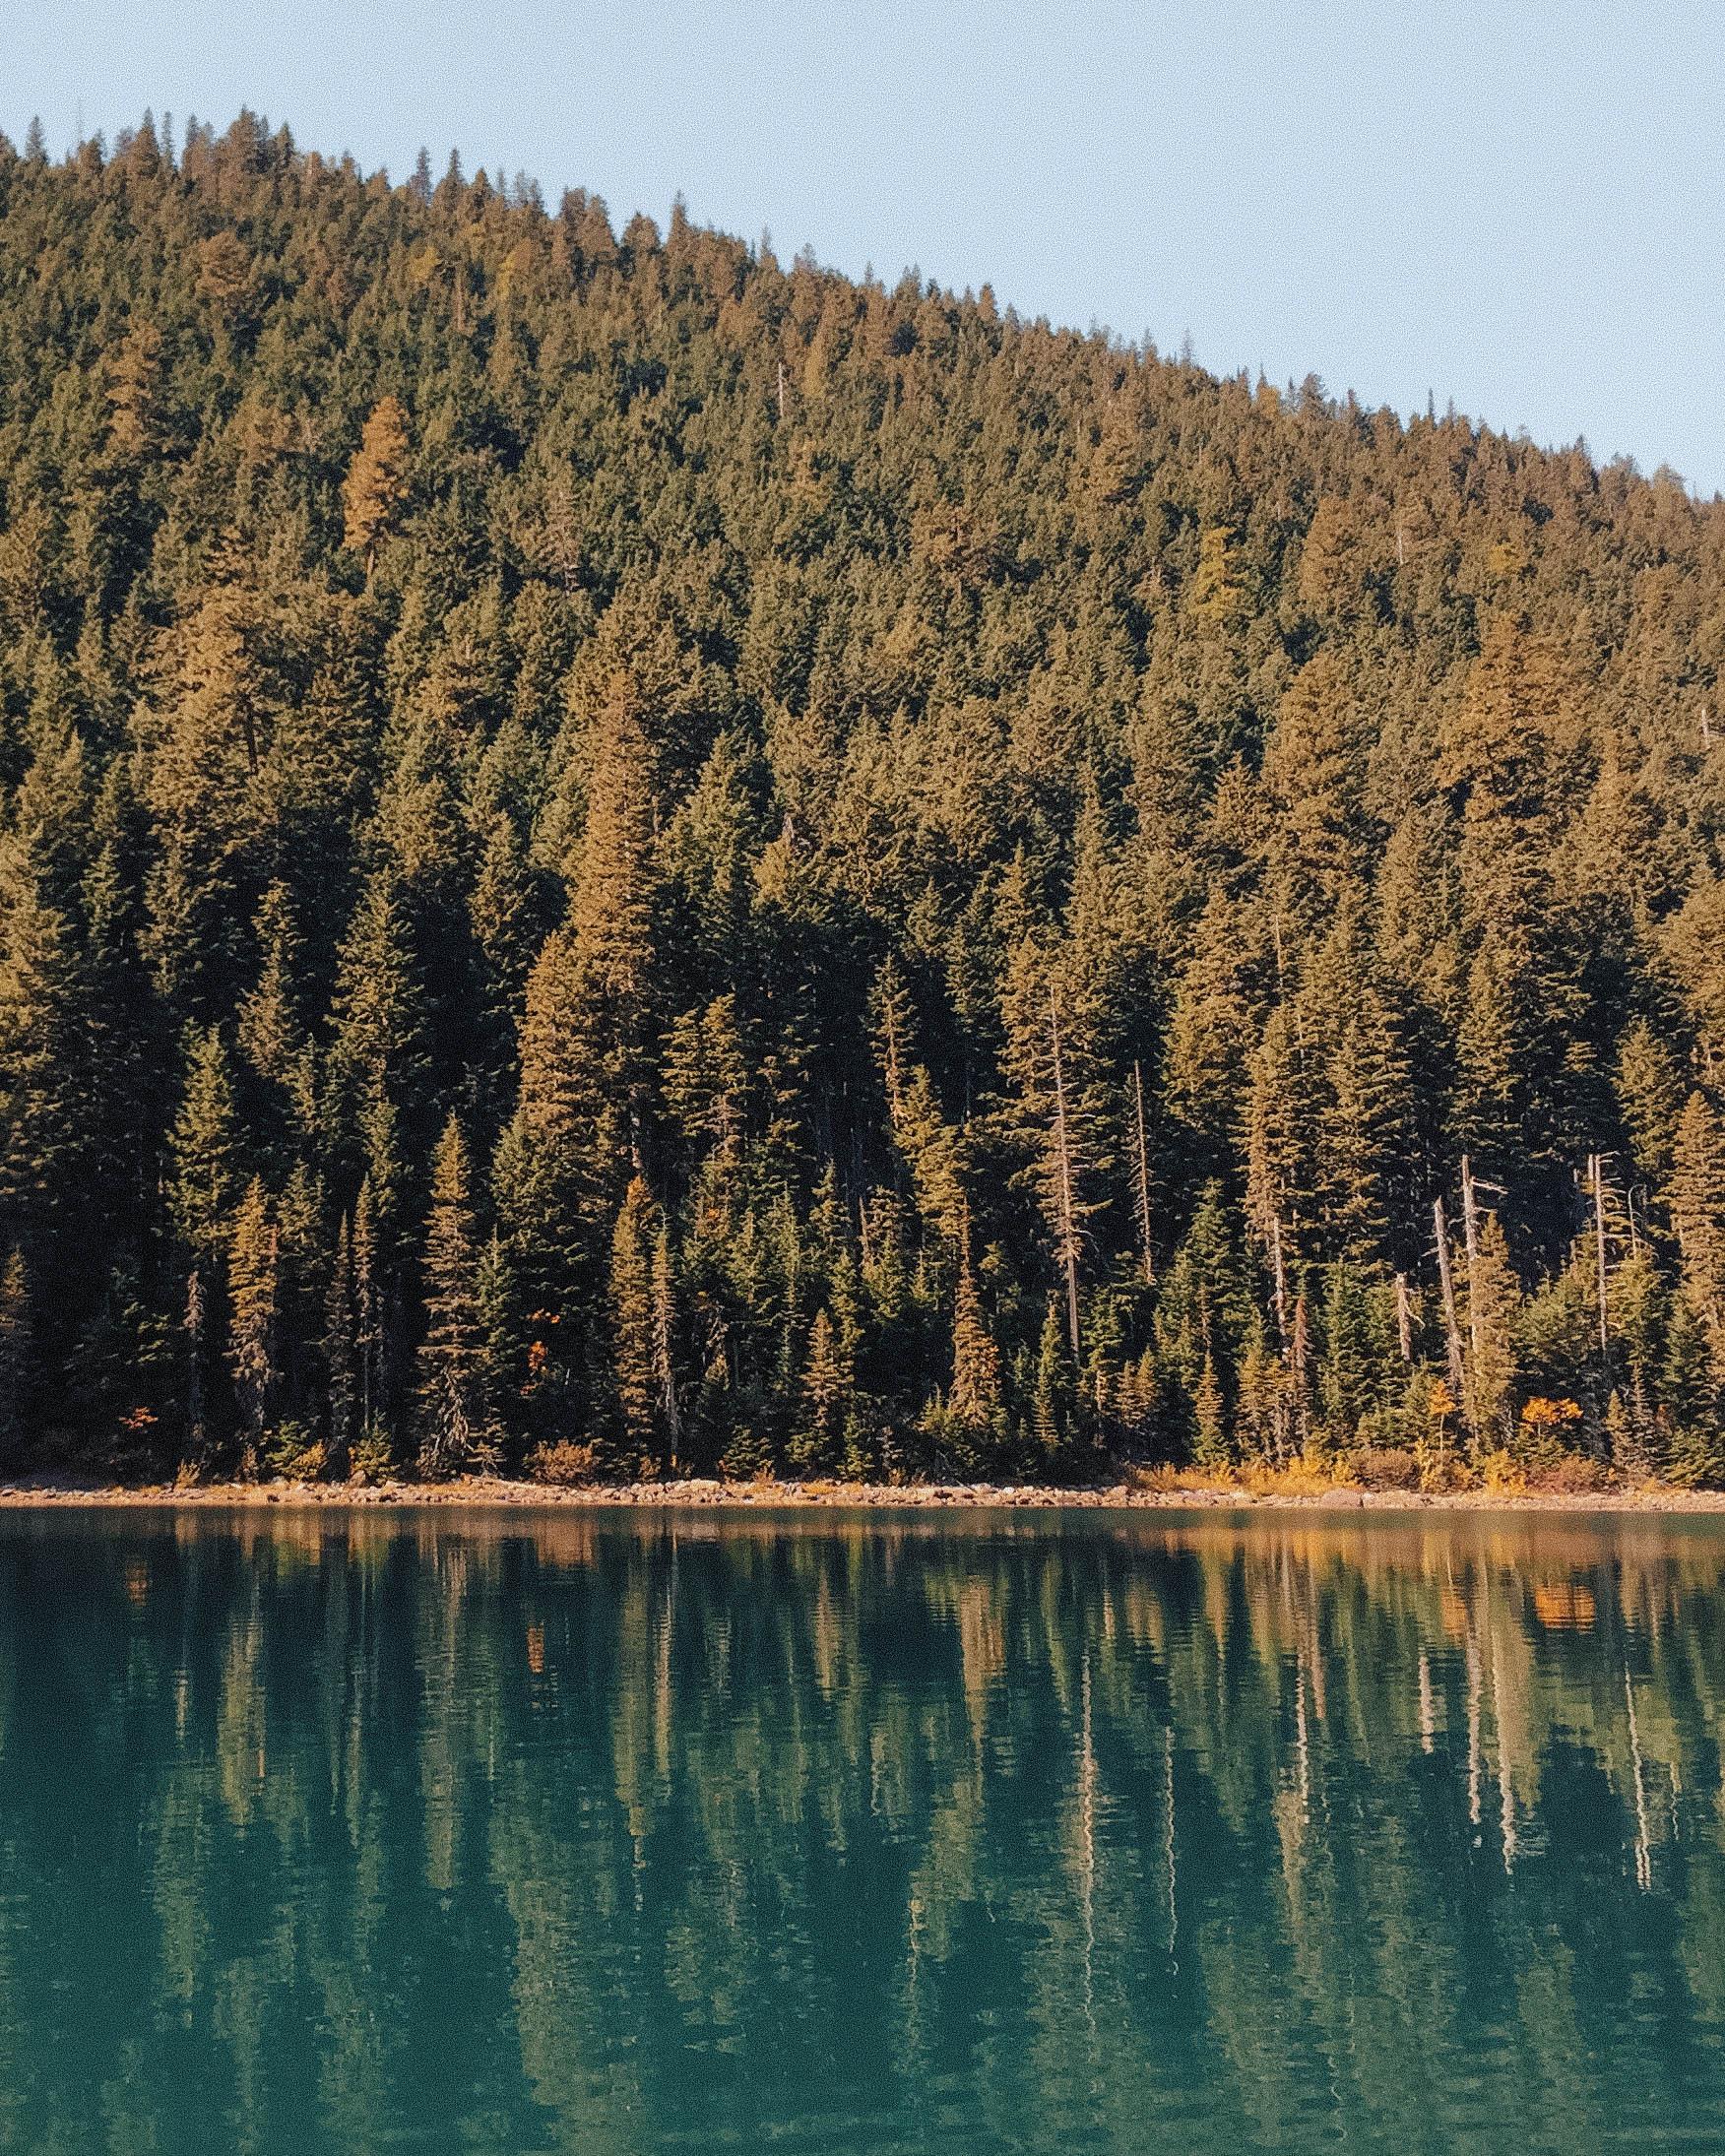 National Parks Camping - The Badlands / Yellowstone National Park /Glacier National Park /Grand Tetons /Arches National Park, Canyonlands National Park /Custer State Park /Black Hills National Forrest /Mount Rushmore, Devils Tower, the Pueblos of Mesa Verde / 3 weeks / iphone 6